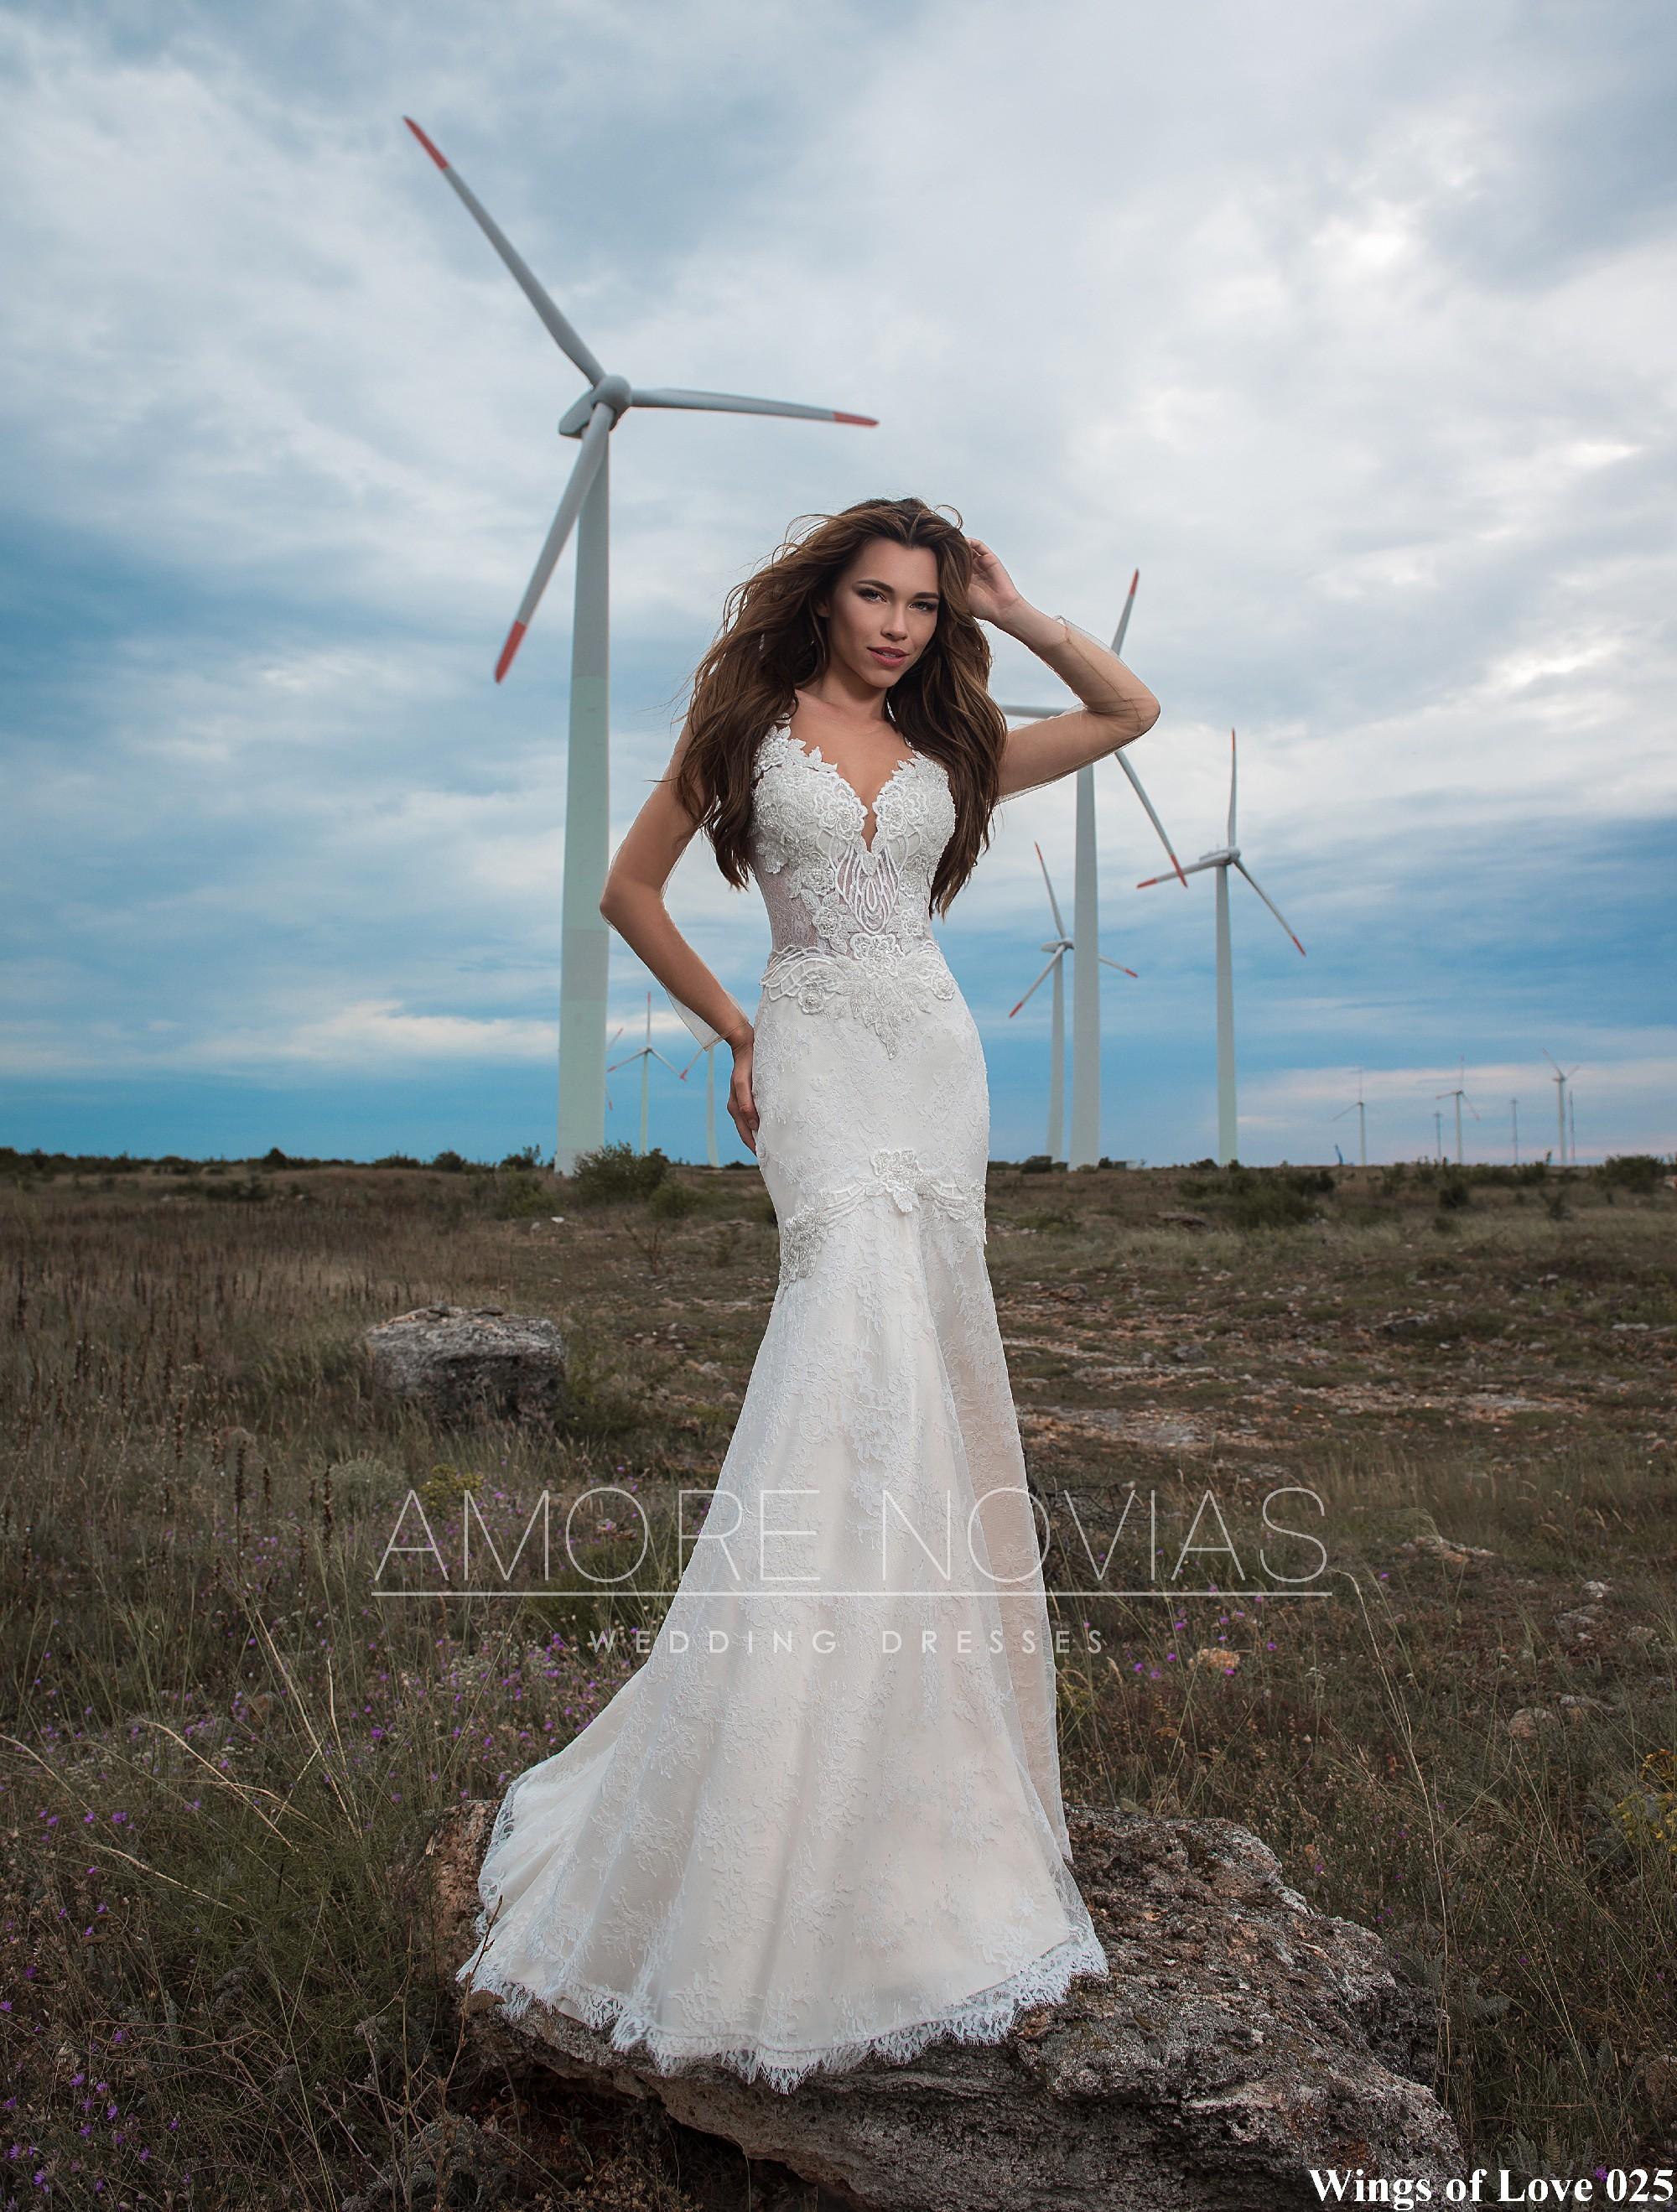 http://amore-novias.com/images/stories/virtuemart/product/lk-025-------(1).jpg